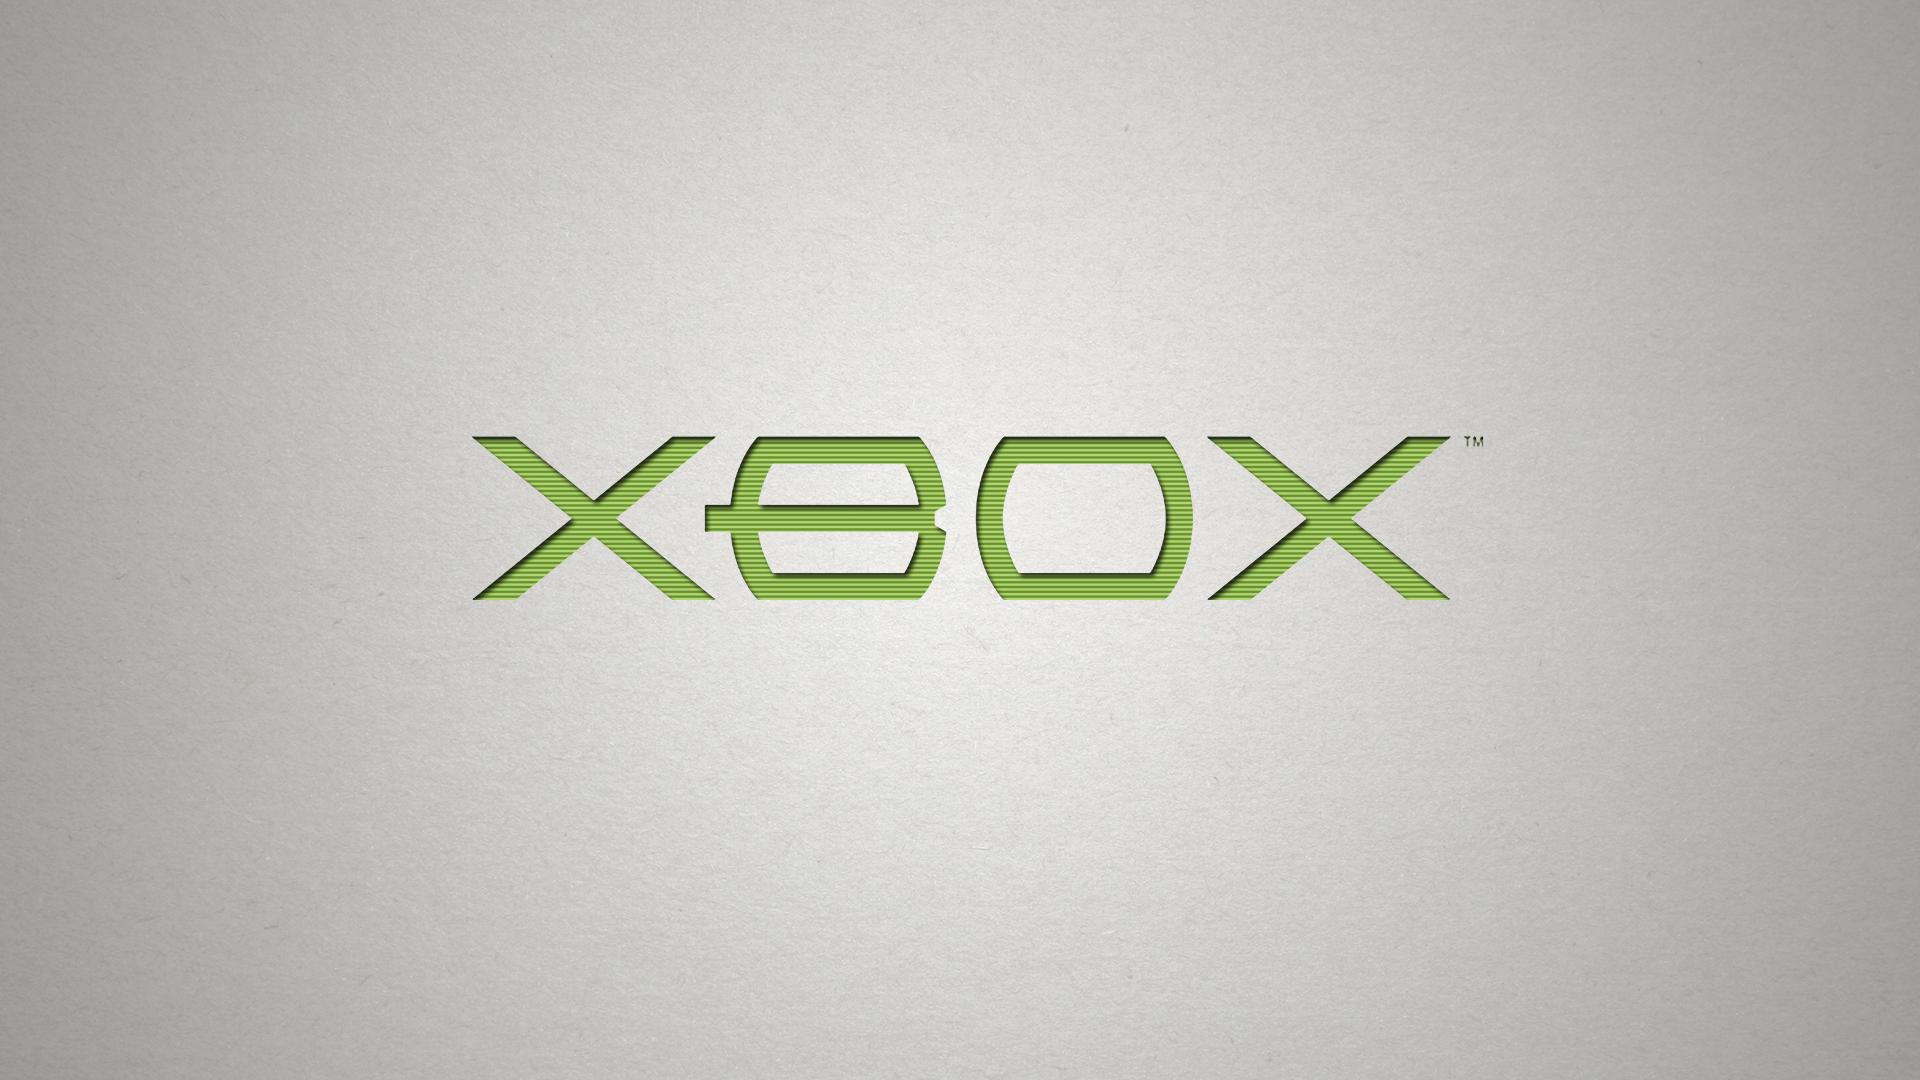 xbox hd wallpaper | background image | 1920x1080 | id:456346